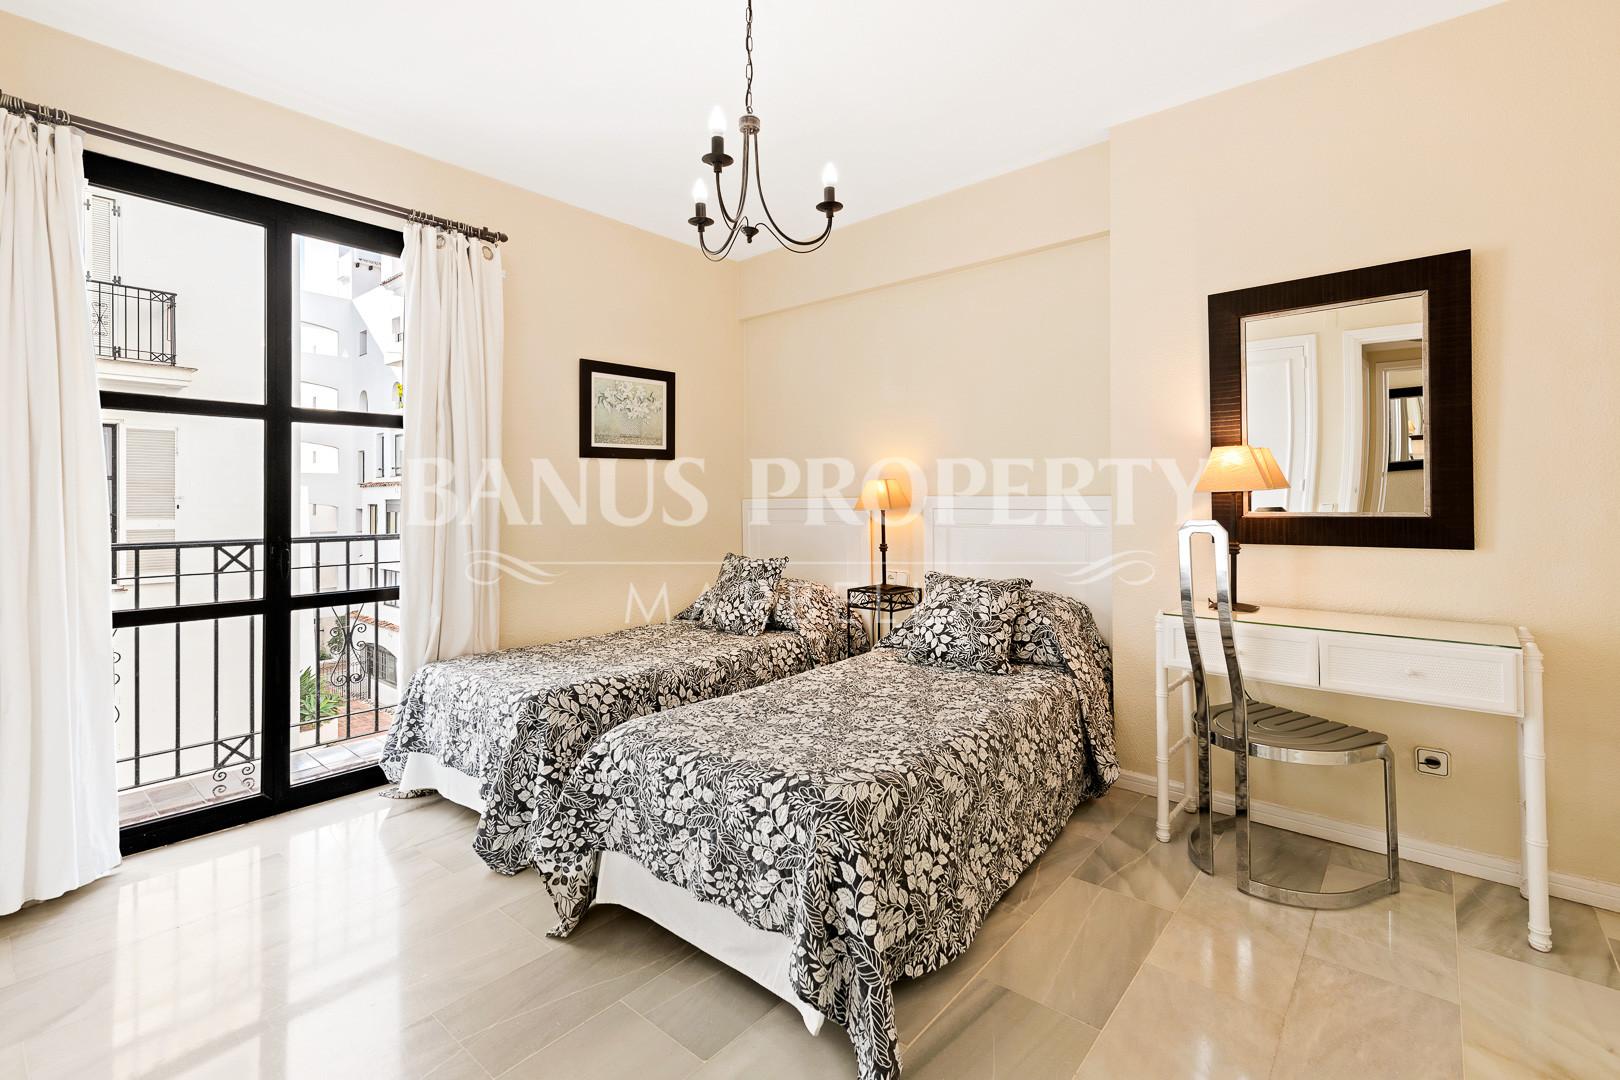 2- bedroom apartment in the frontline beach of Playas del Duque- Puerto Banus